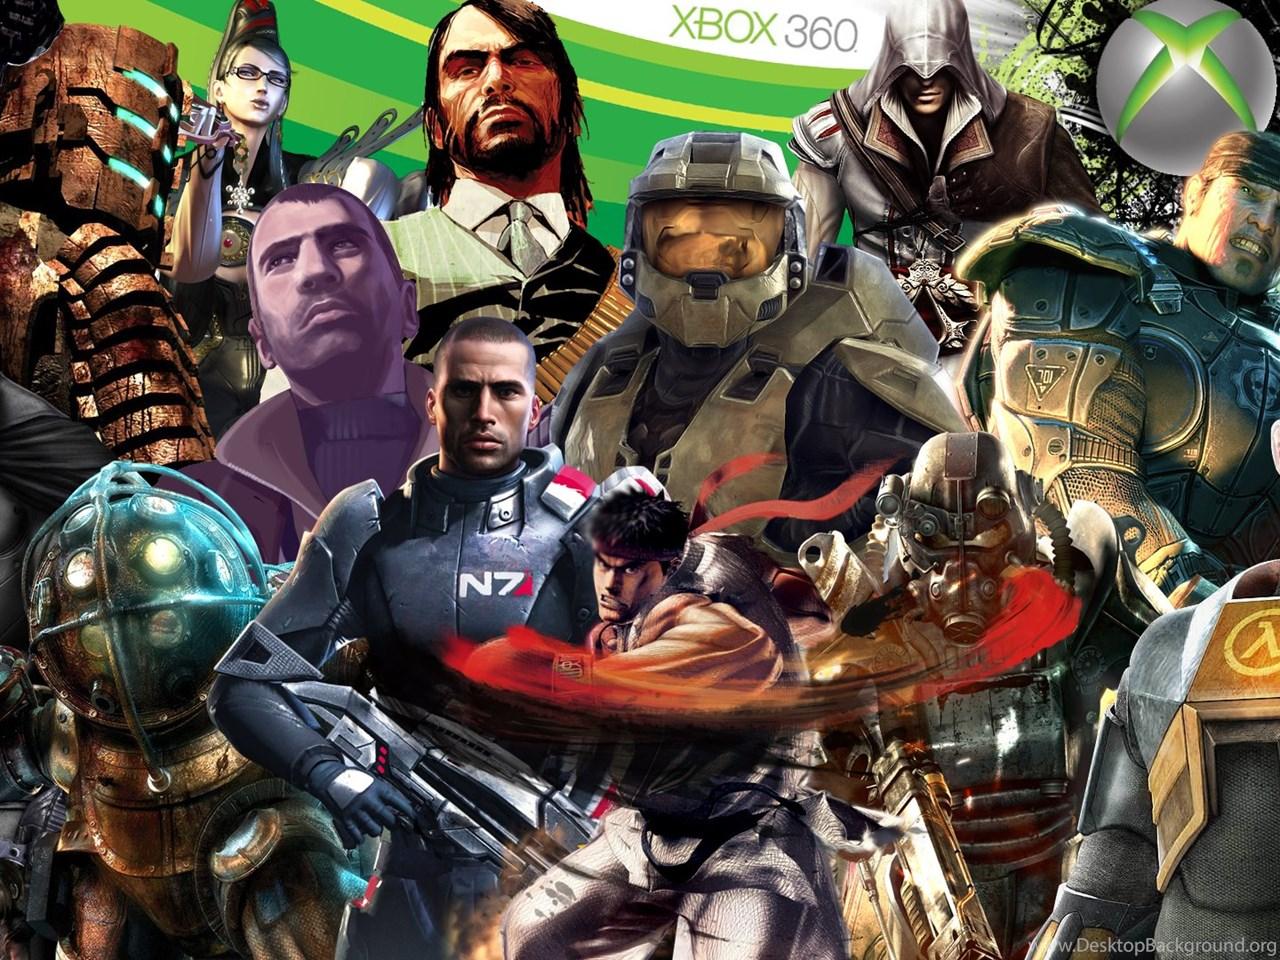 Xbox 360 Gamer Wallpapers Desktop Background